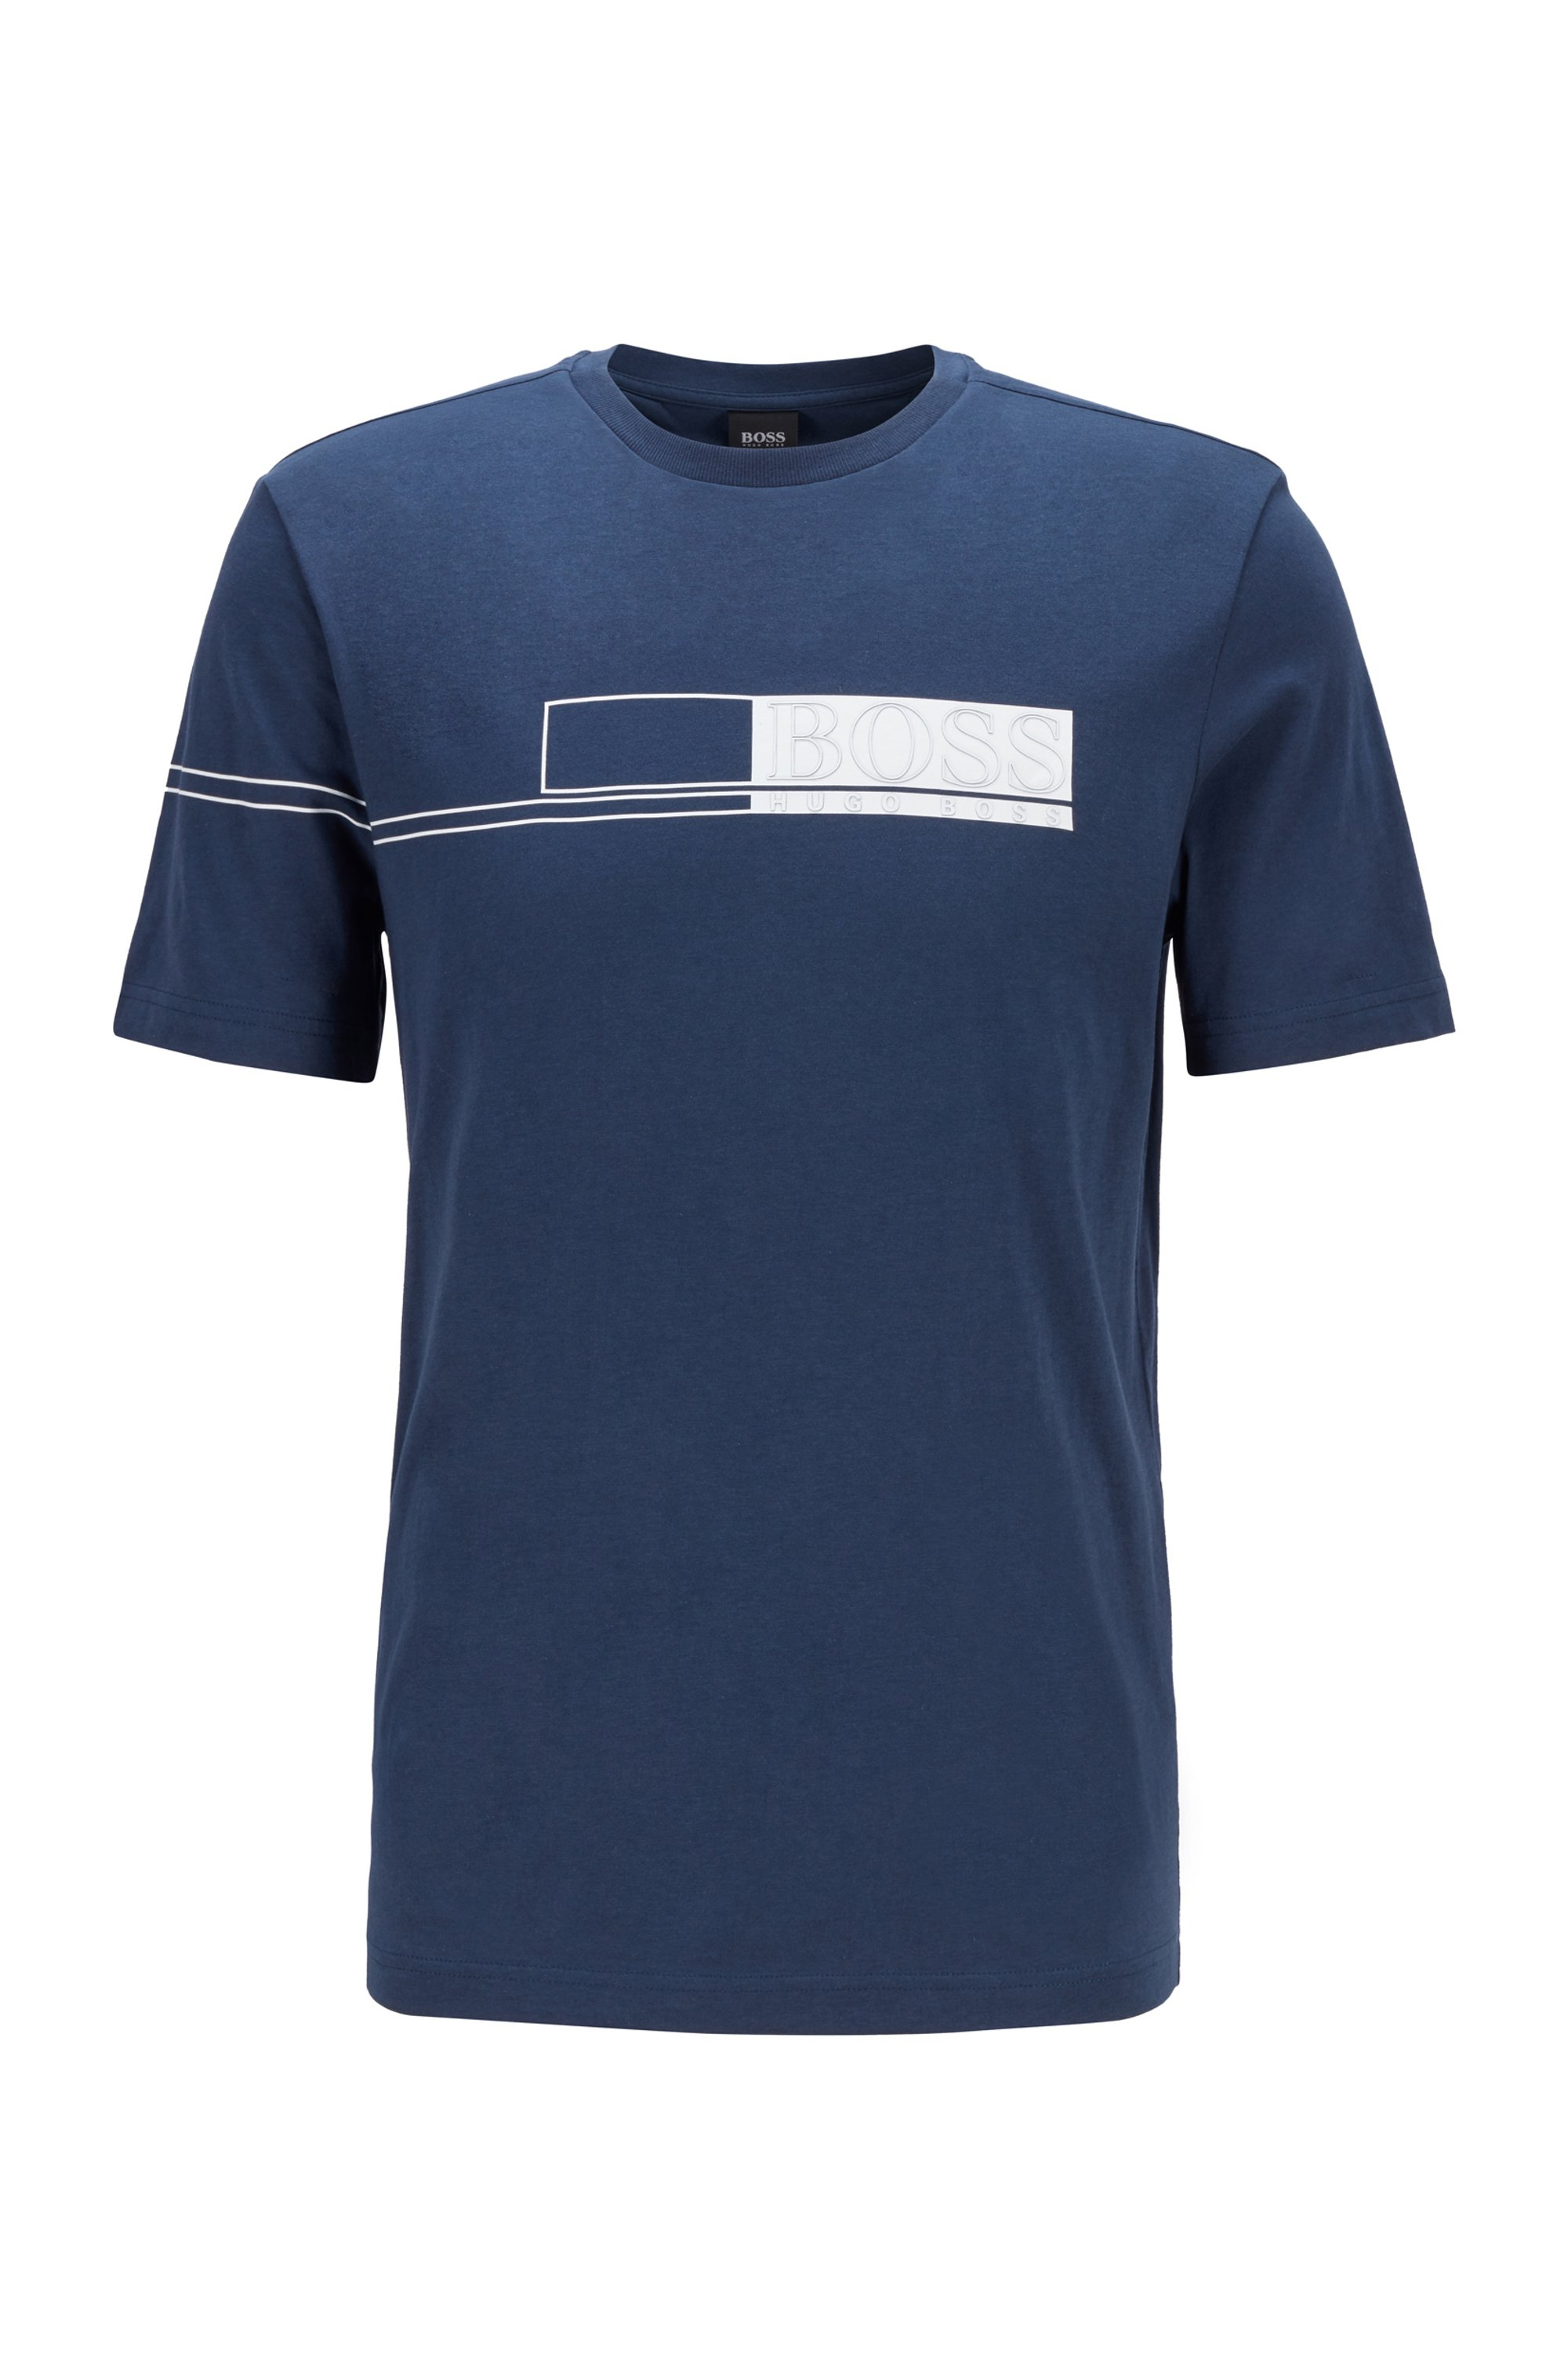 Pure-cotton T-shirt with block-print logo, Dark Blue